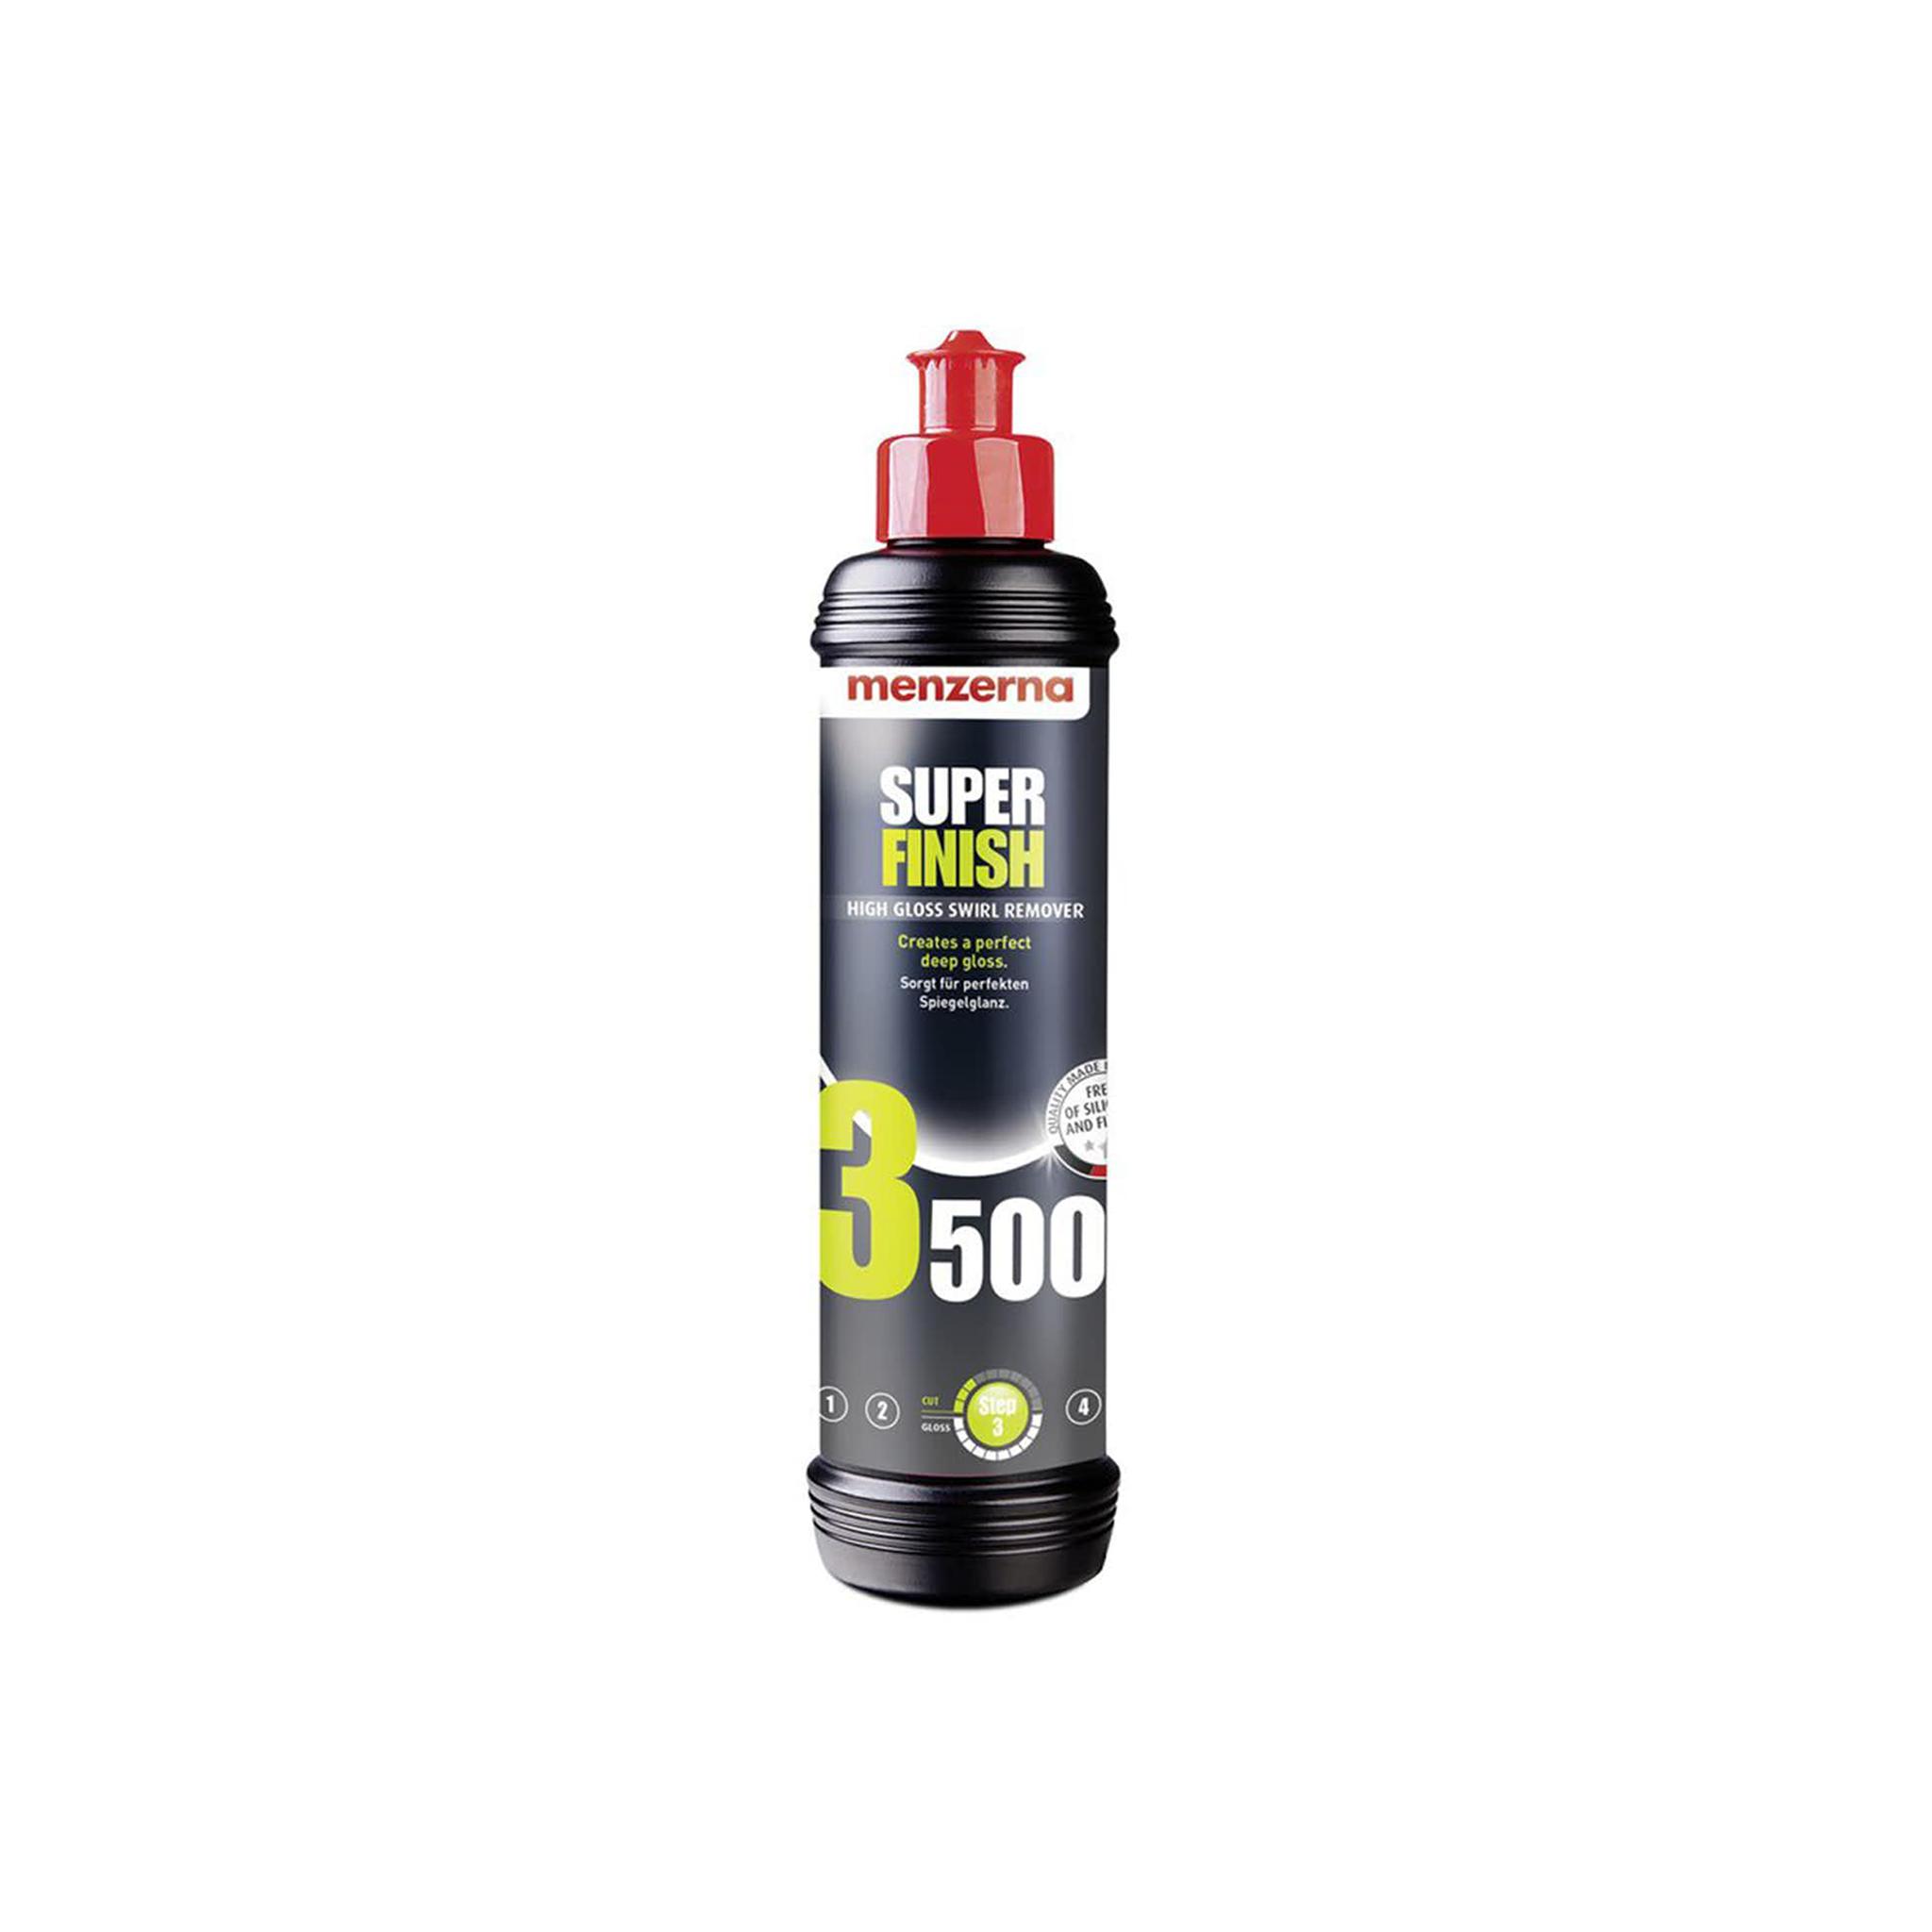 Polermedel Menzerna Super Finish 3500, Finishing, 1000 ml